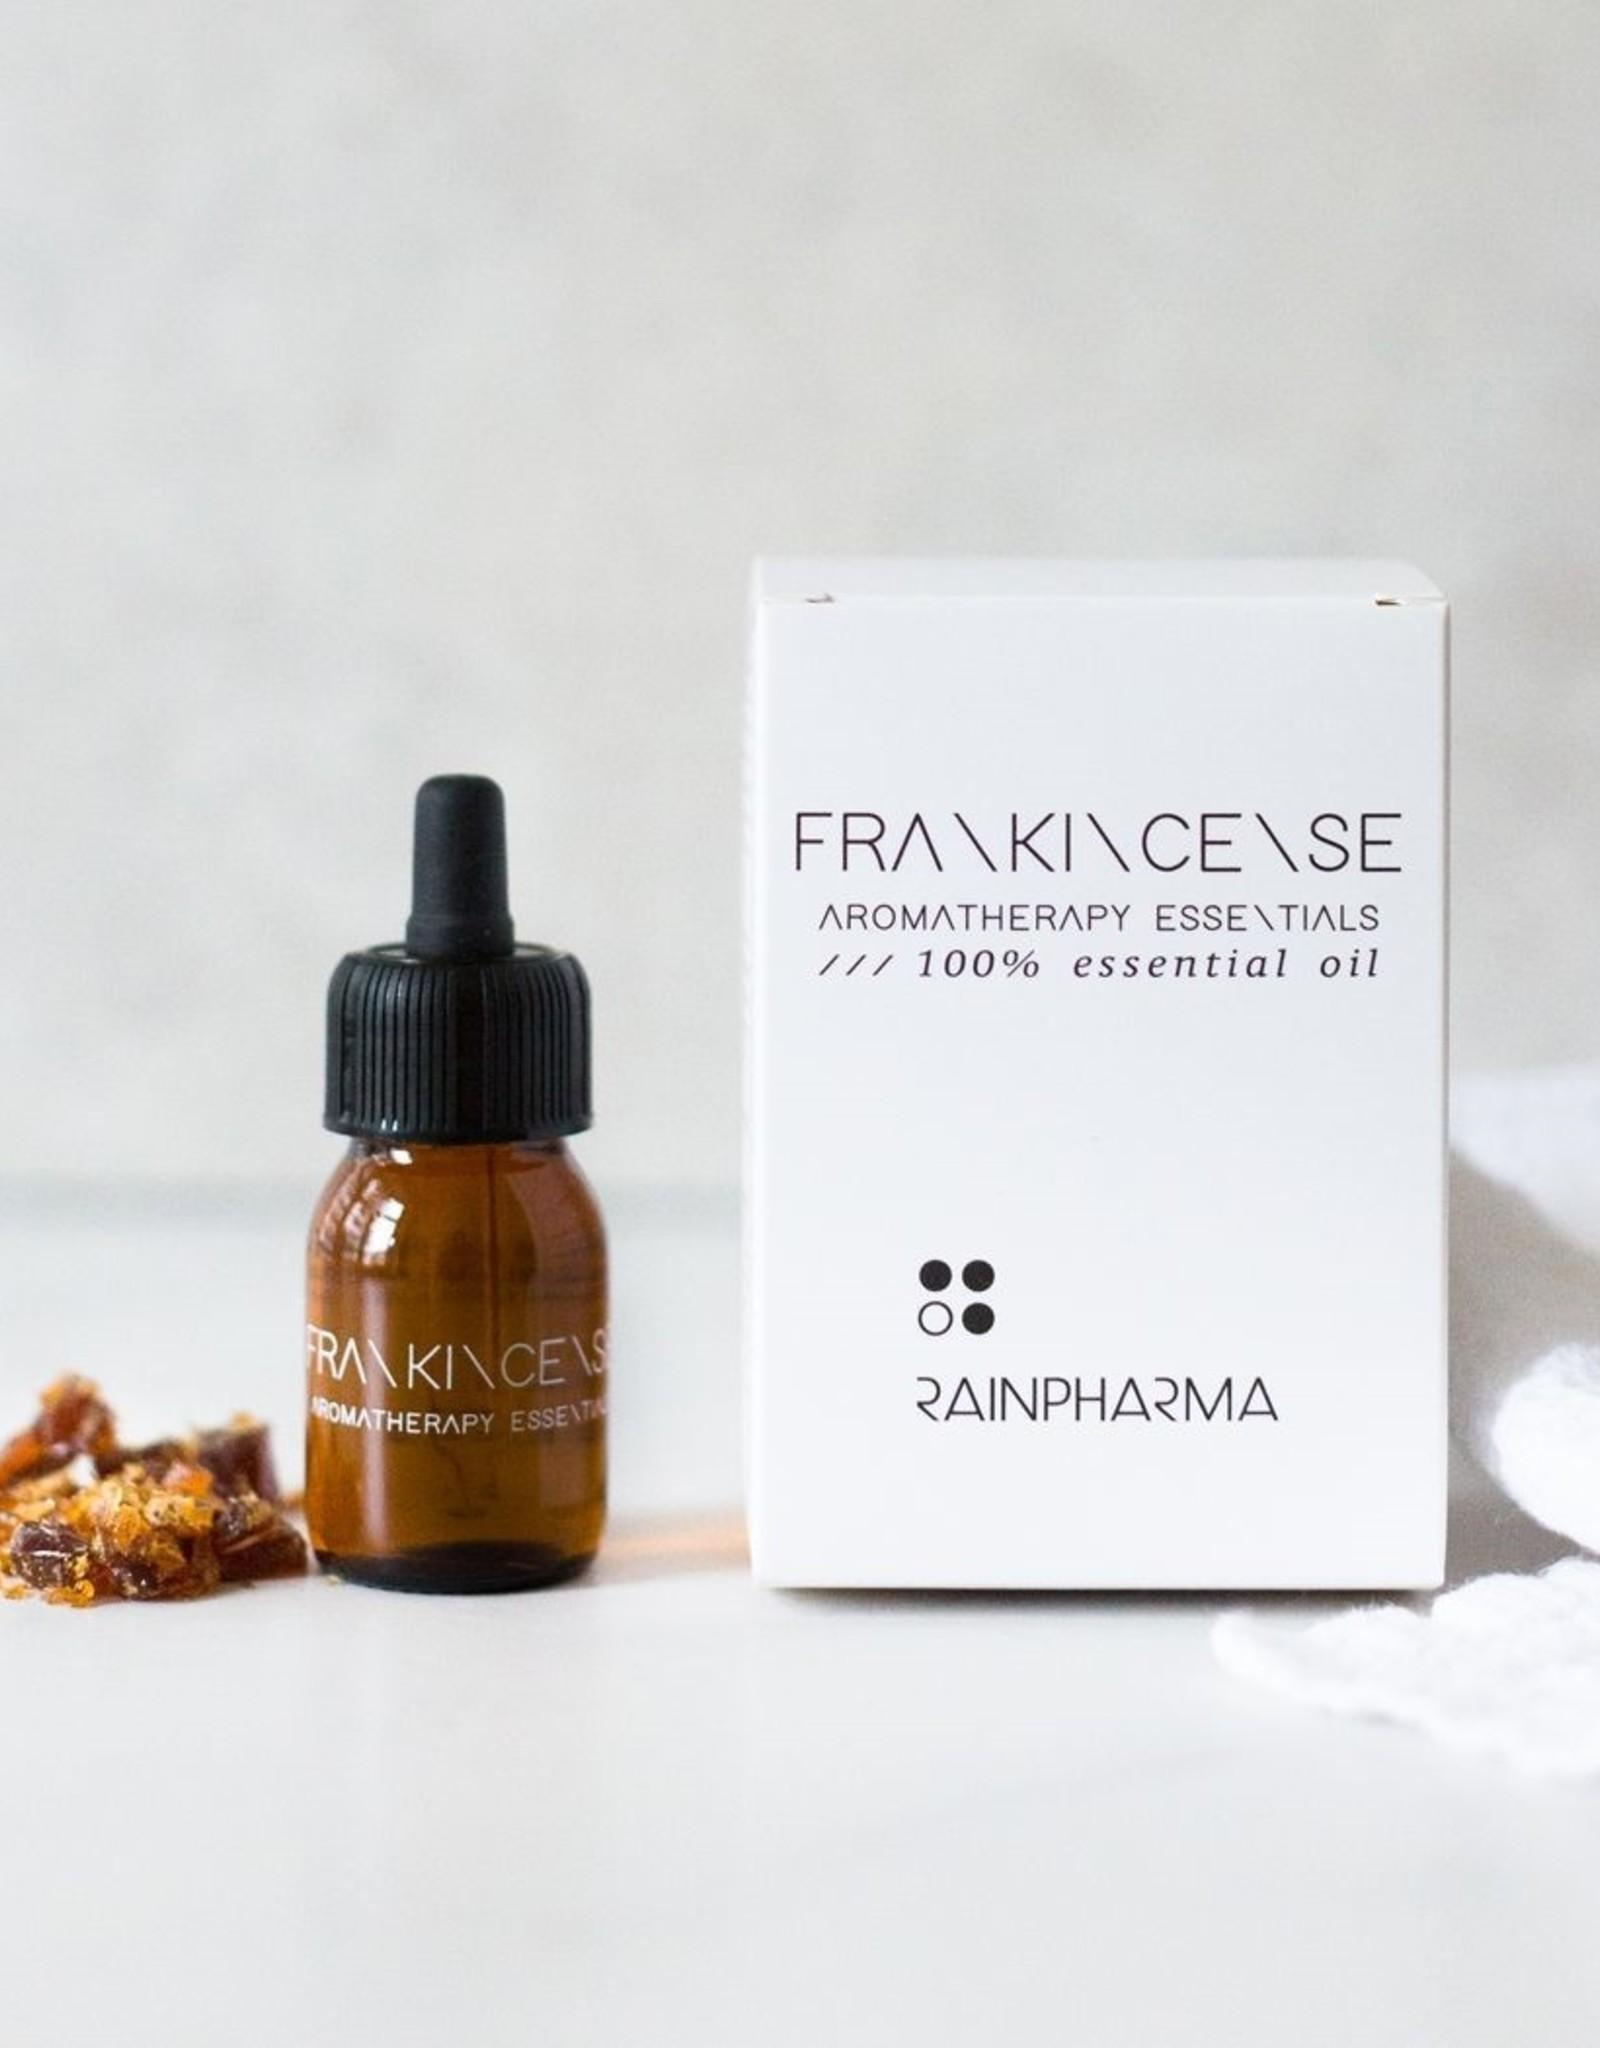 RainPharma Rainpharma - Essential Oil Frankincense 30ml